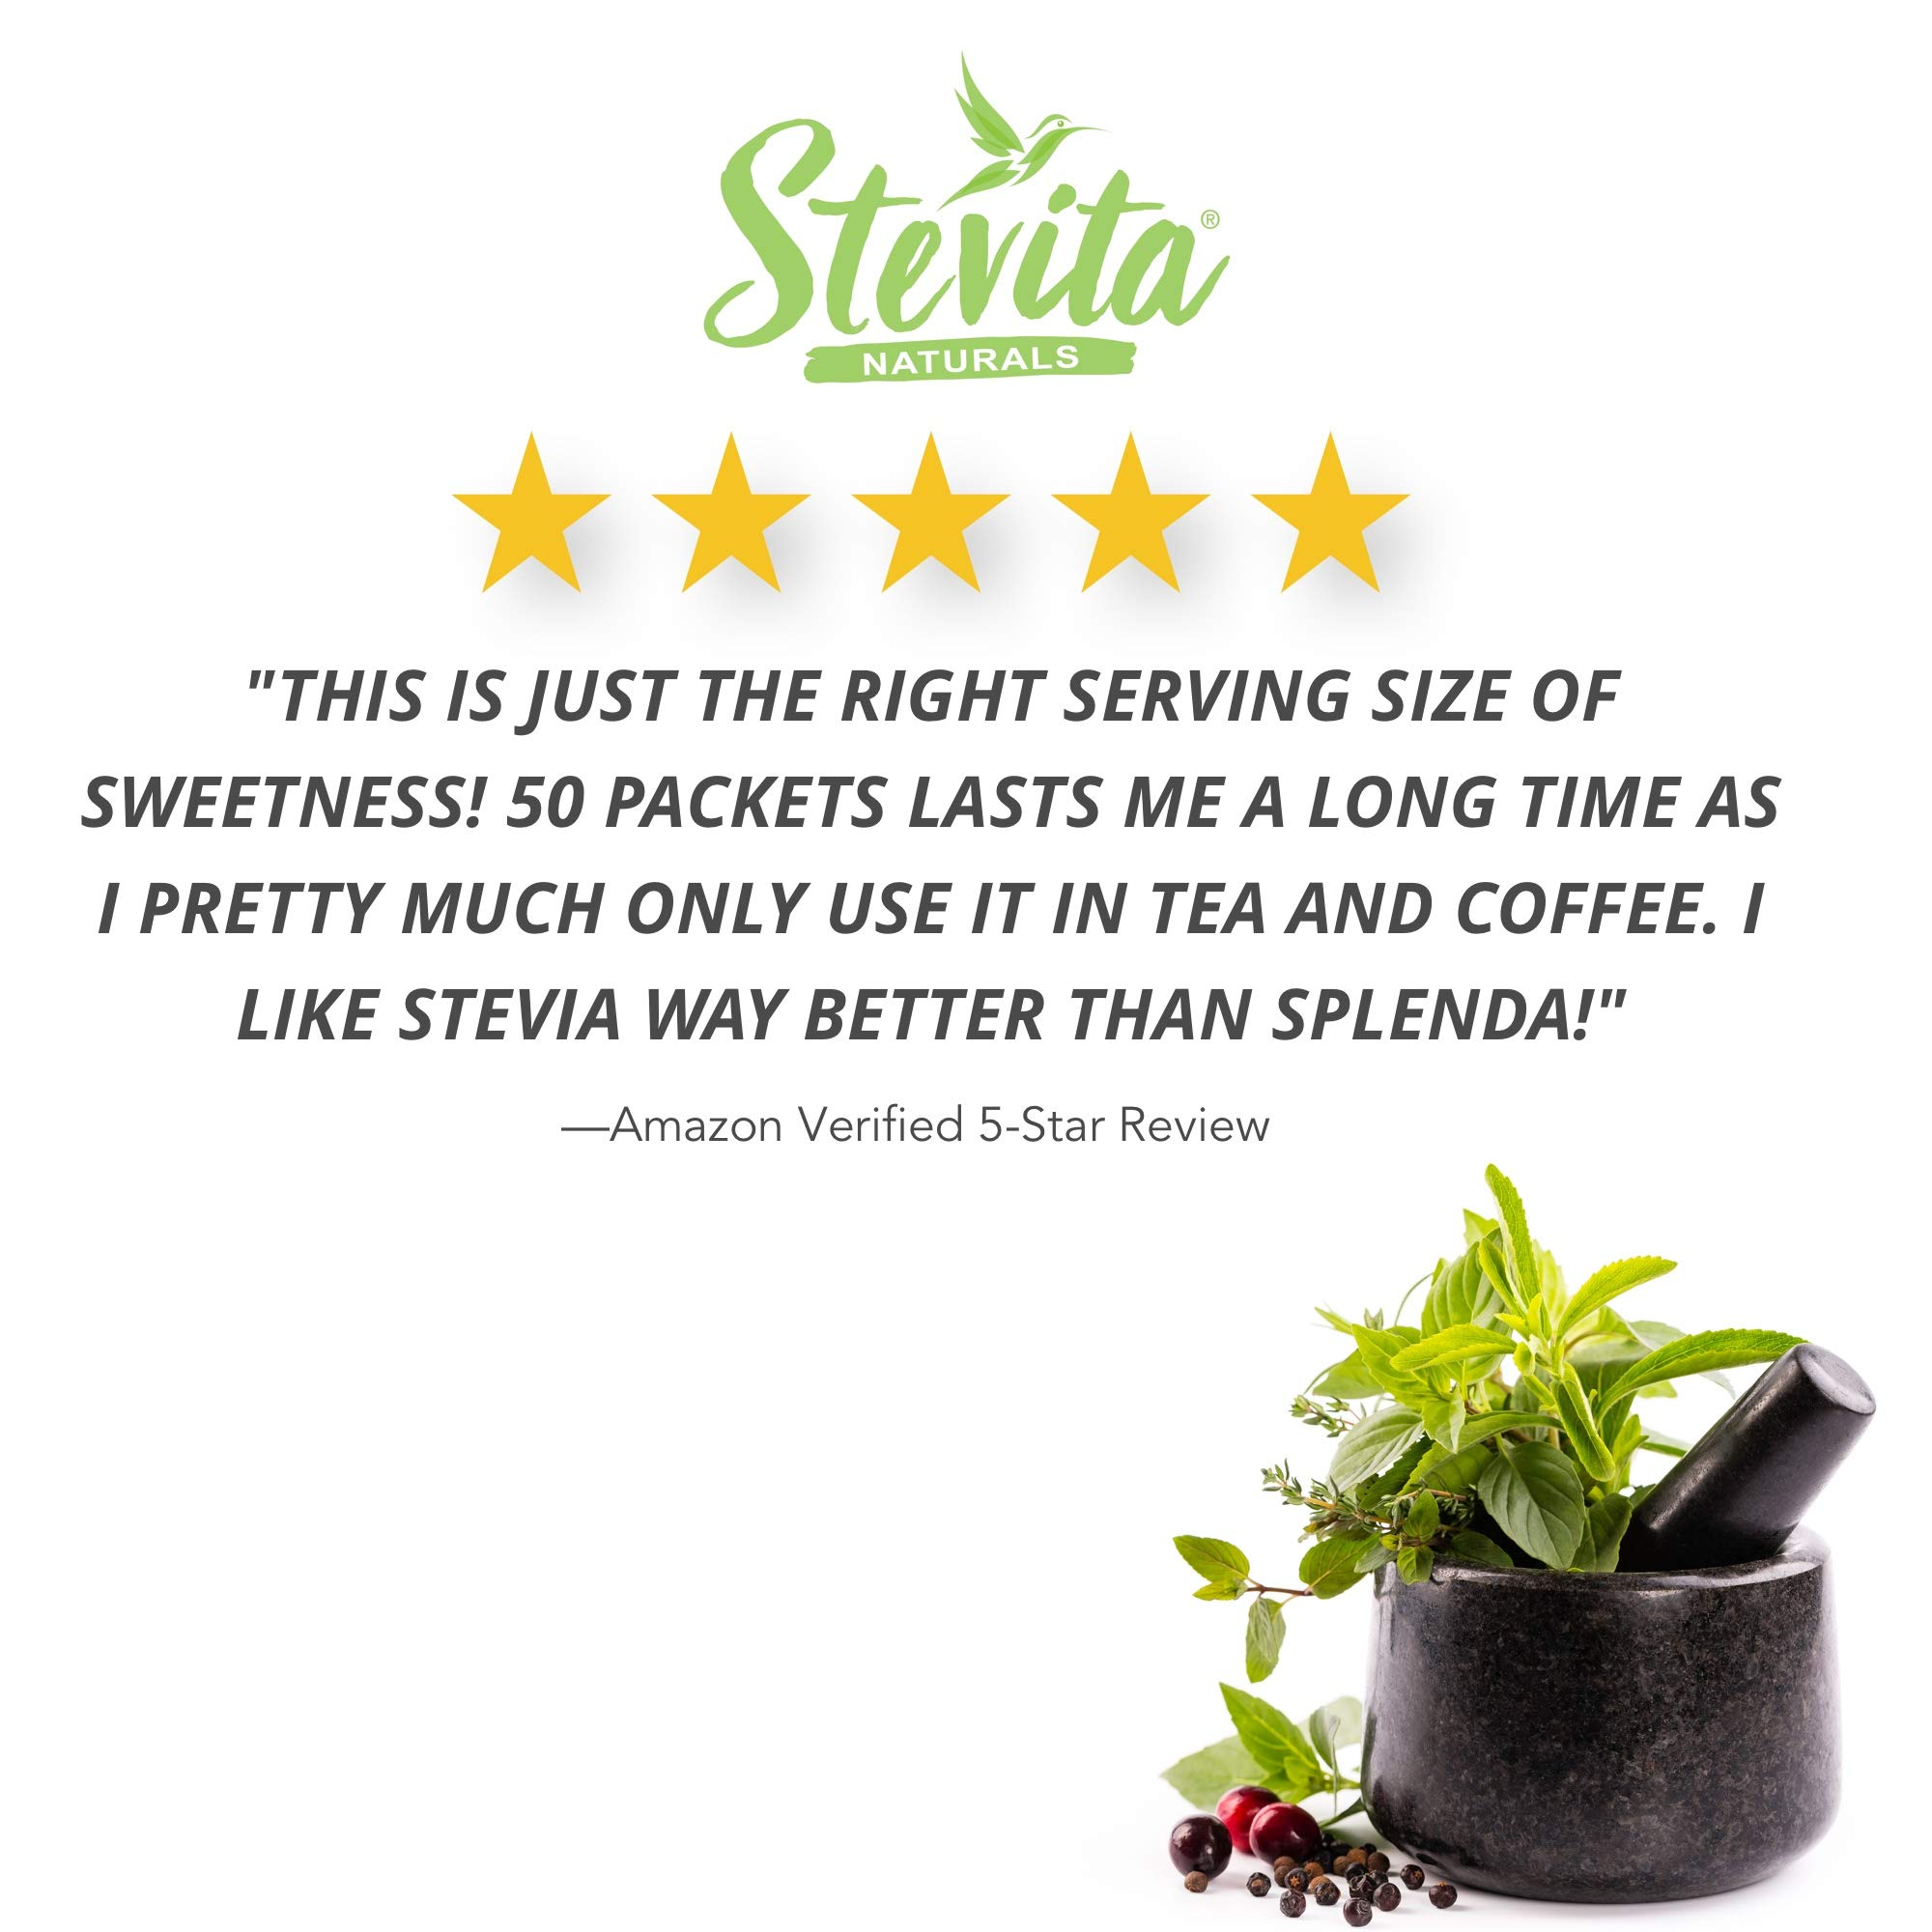 Stevita Stevia Organic Spoonable Stevia Powder - 50 Packets - Stevia & Erythritol All Natural Sweetener, No Calories - USDA Organic, Non GMO, Vegan, Keto, Paleo, Gluten-Free - 50 Servings by STEVITA (Image #2)